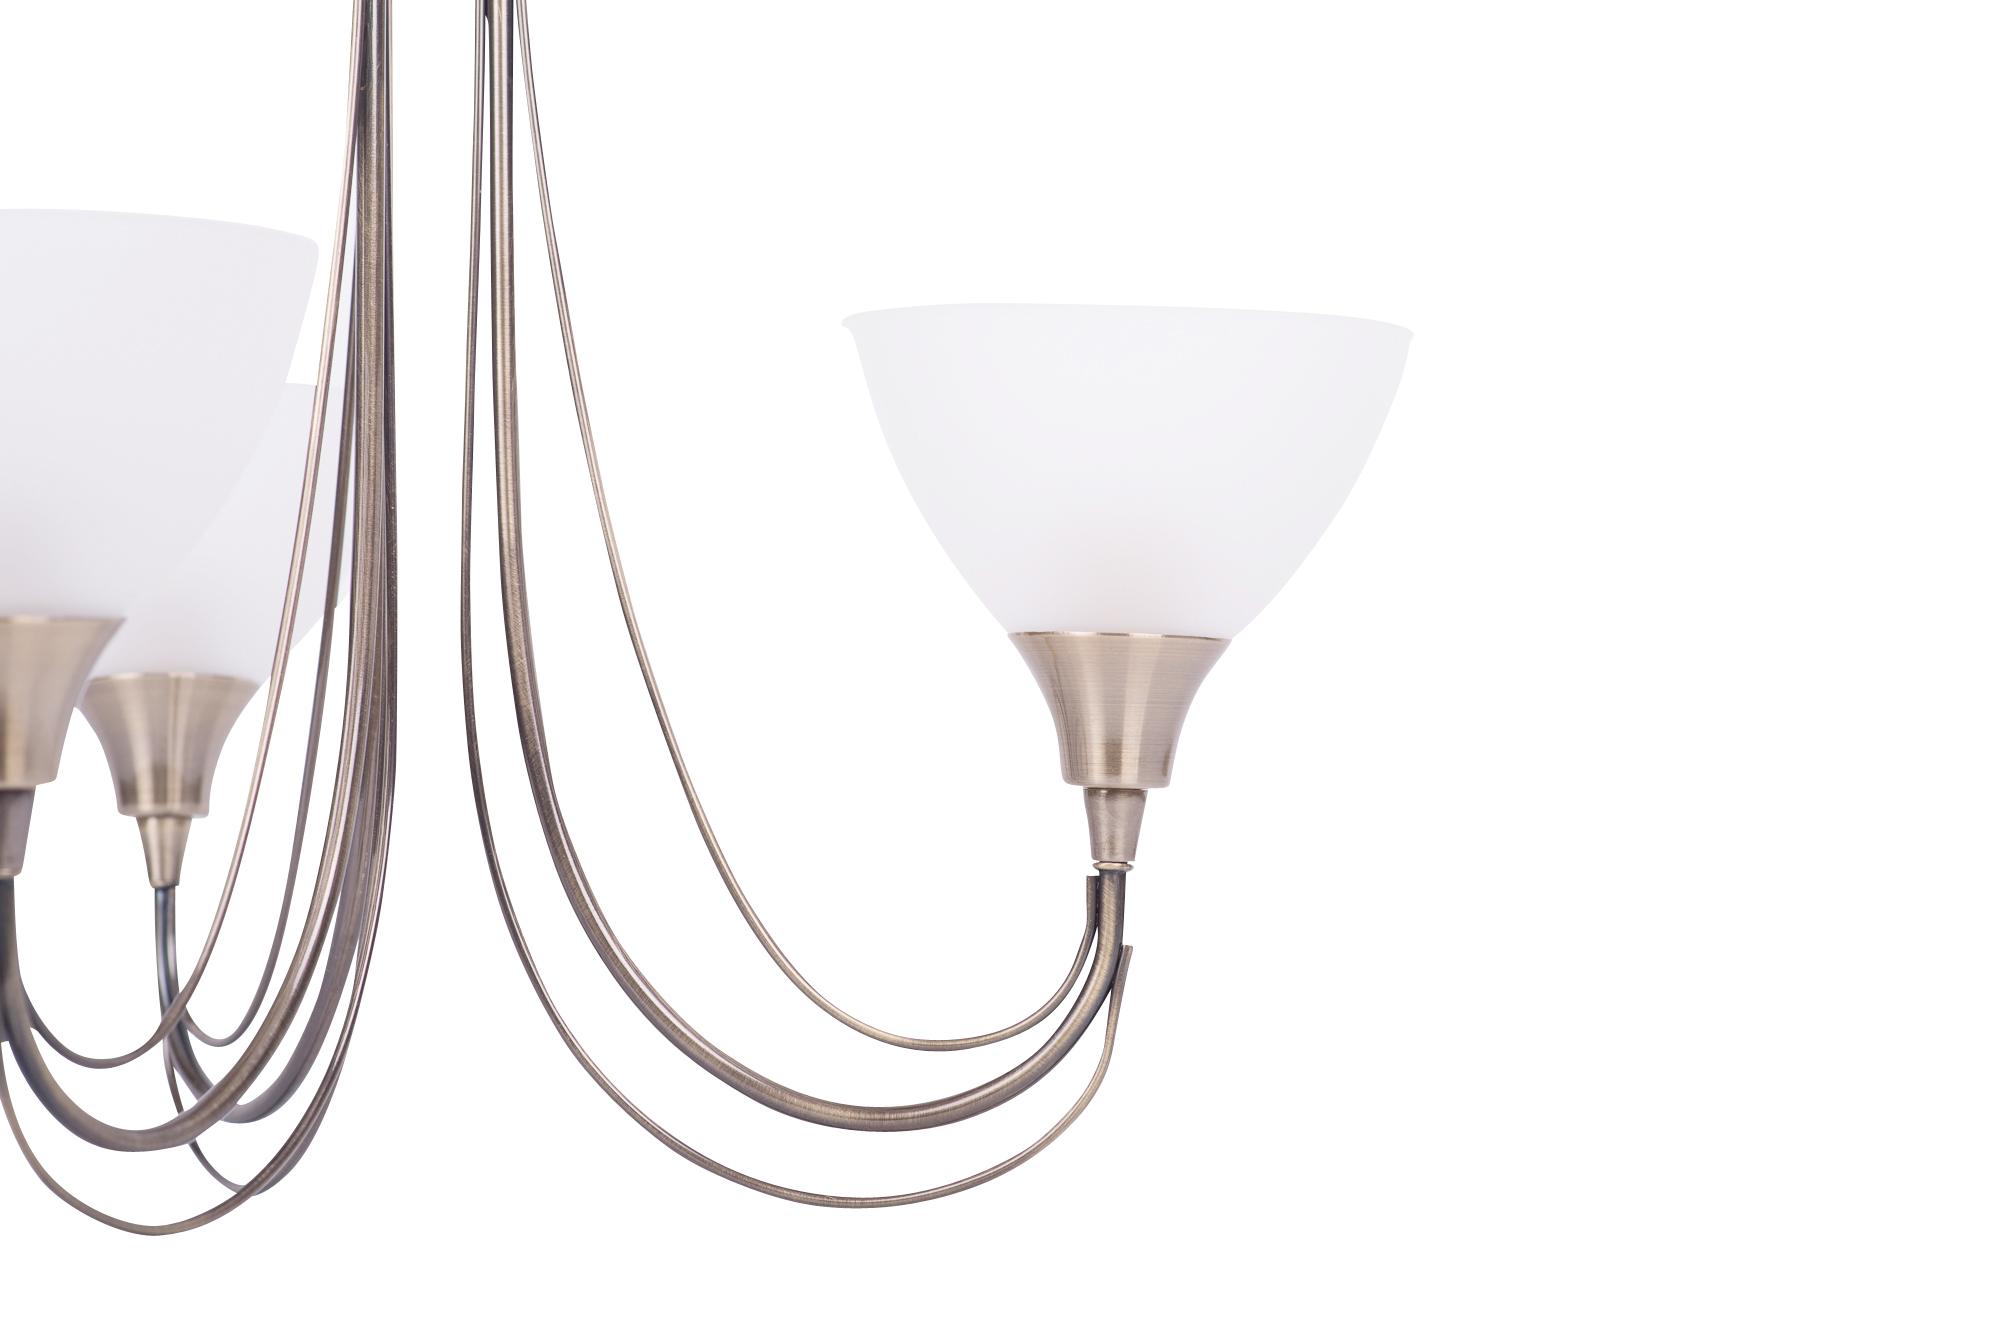 Semi Flush Ceiling Lights Glass Brass Fixture Bathroom: Antique Brass & Frosted Glass 3 Arm Semi Flush Ceiling